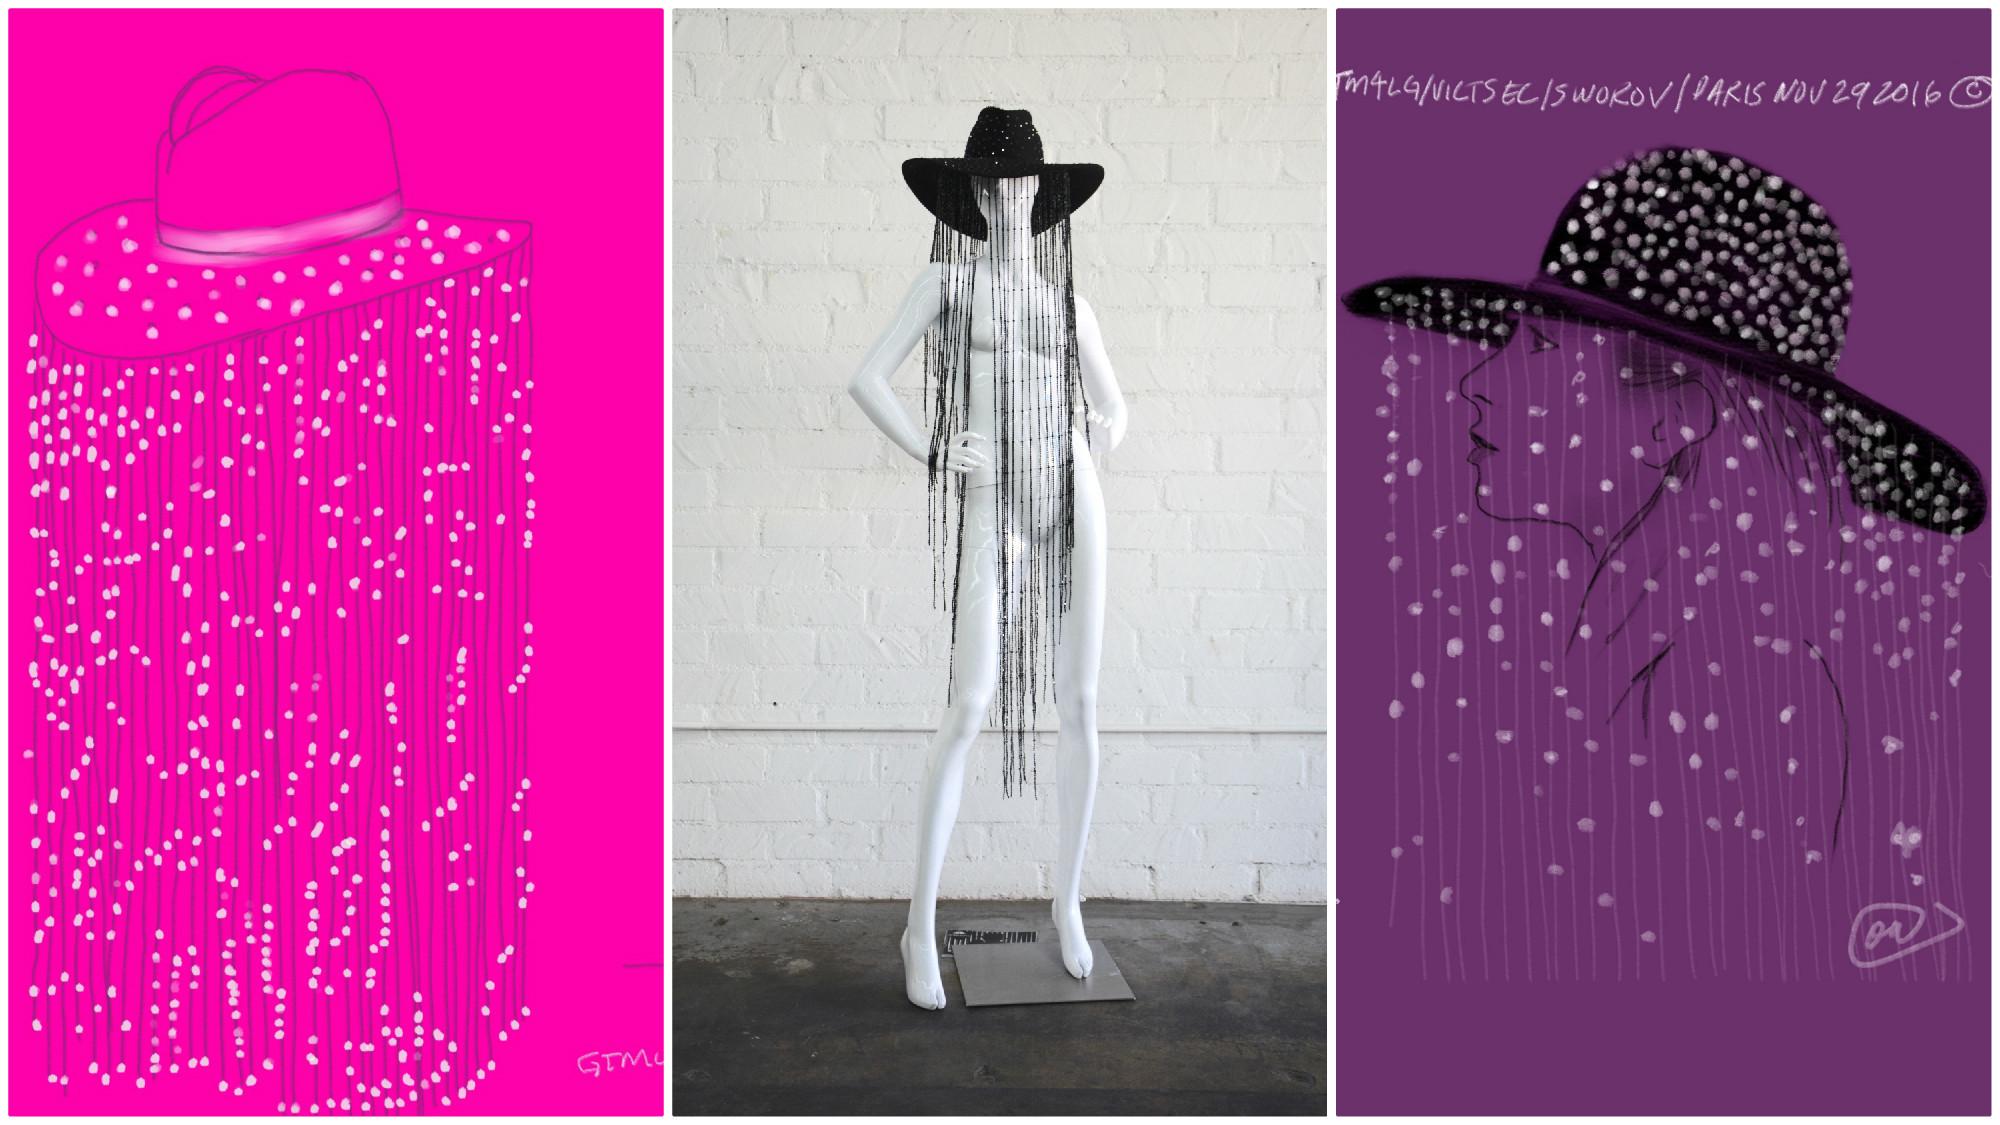 77ca2b157 Hats off to Lady Gaga's bespoke Victoria's Secret Fashion Show ...